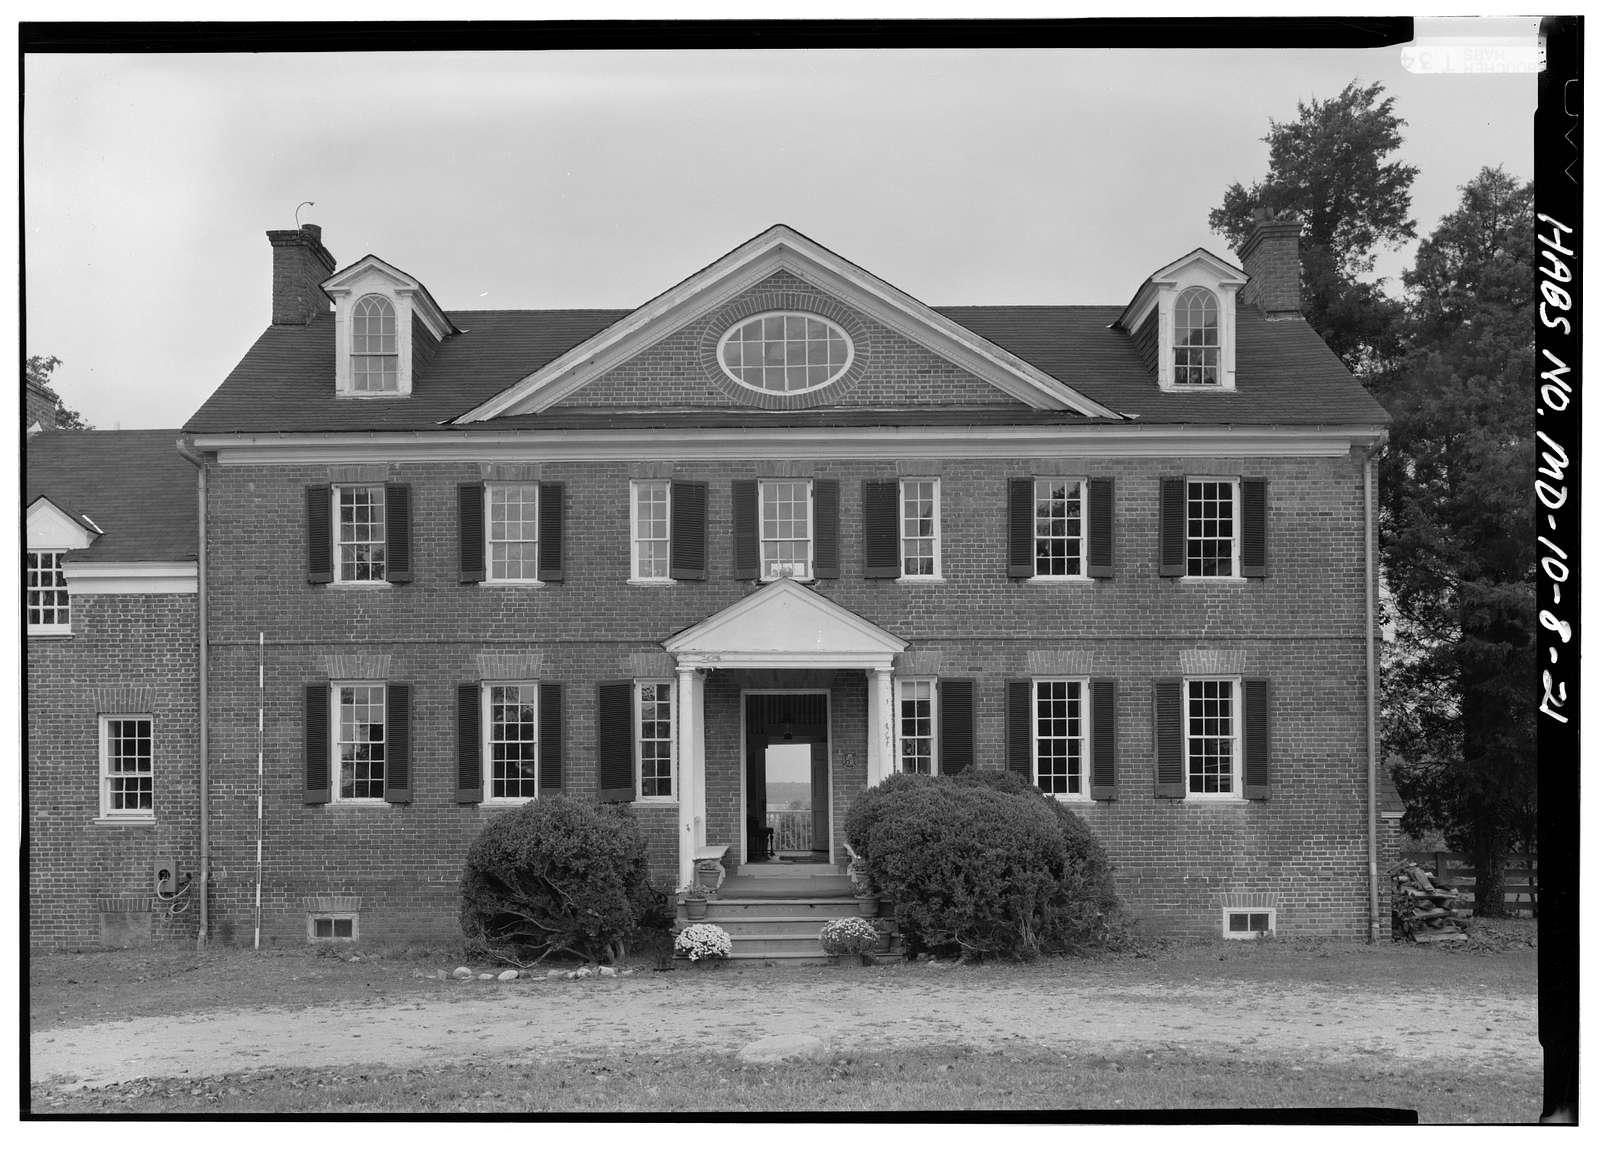 Harmony Hall, 10500 Livingstone Road (10511 Livingstone Road), Friendly, Prince George's County, MD